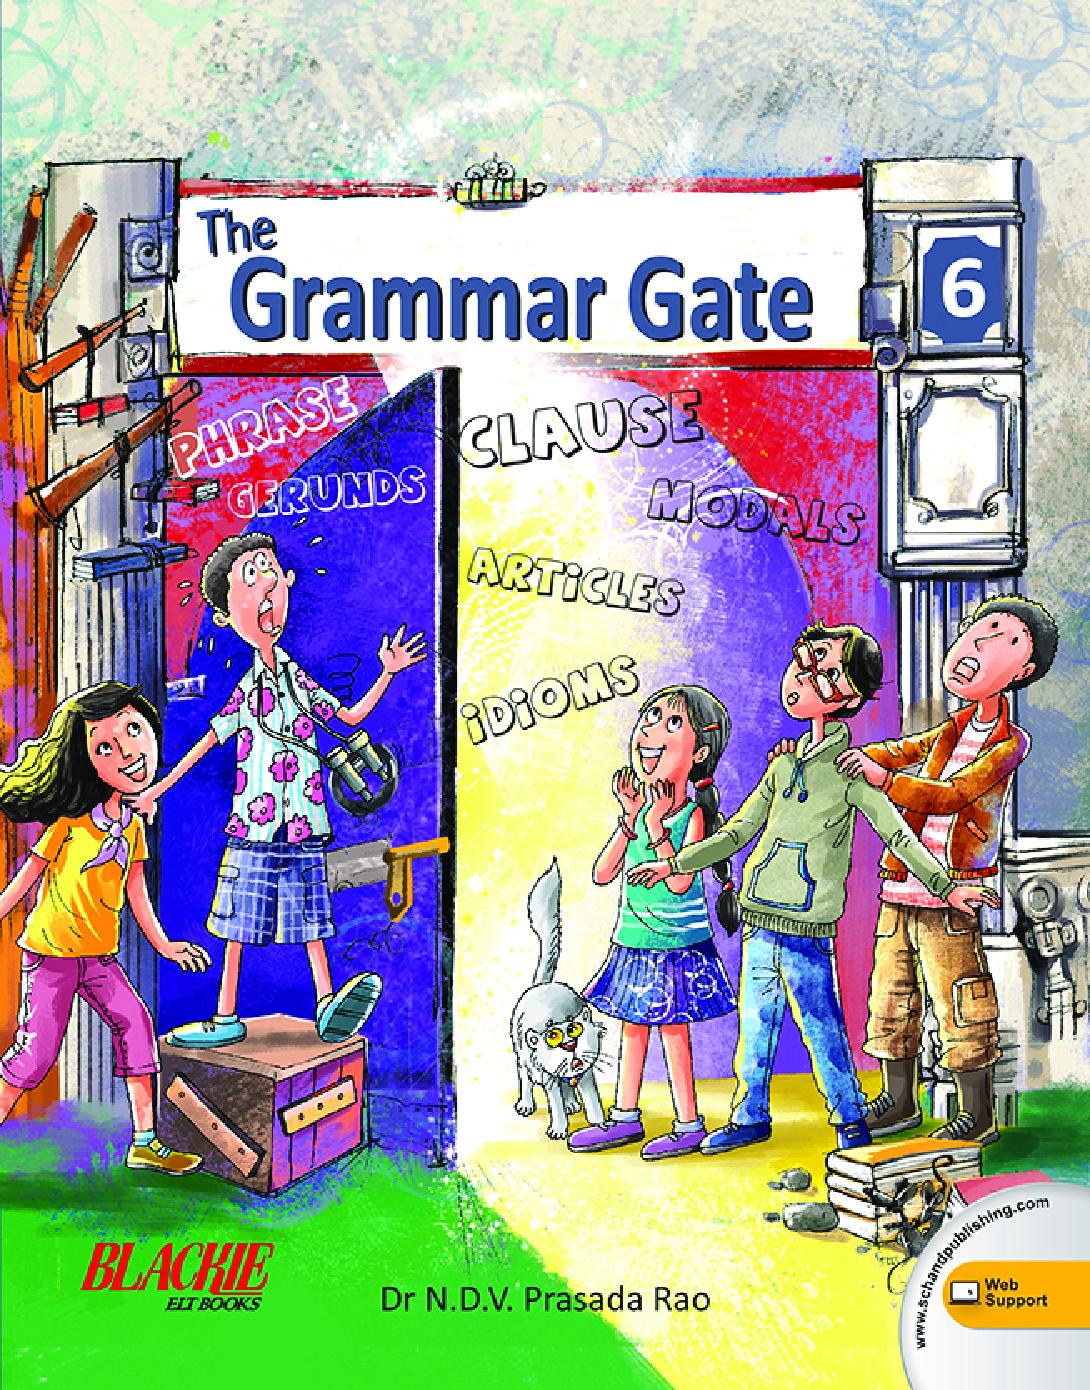 The Grammar Gate Book 6 - Page 1